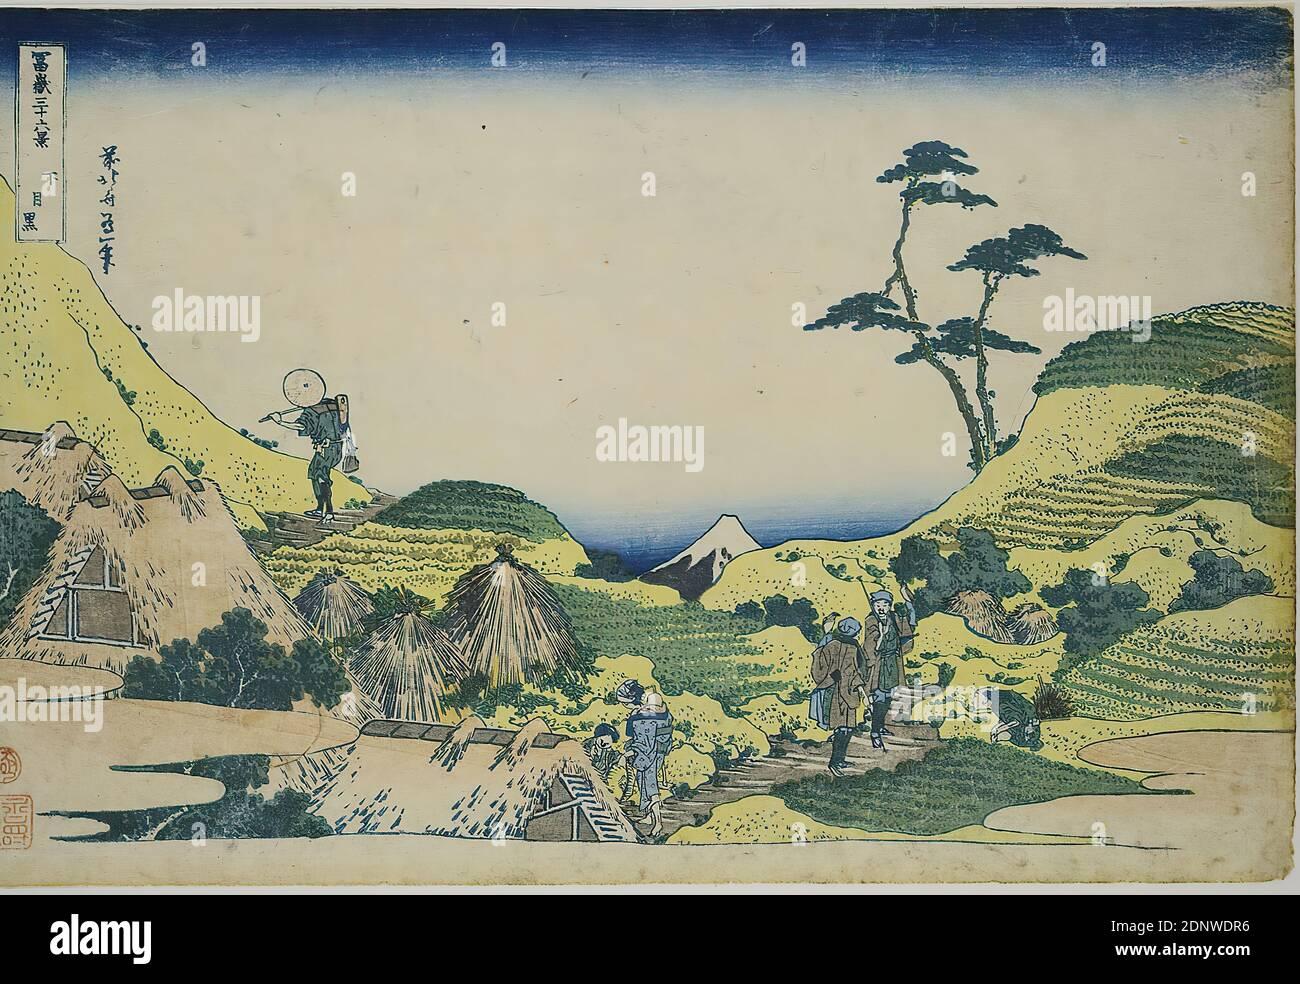 Shimo High Resolution Stock Photography And Images Alamy